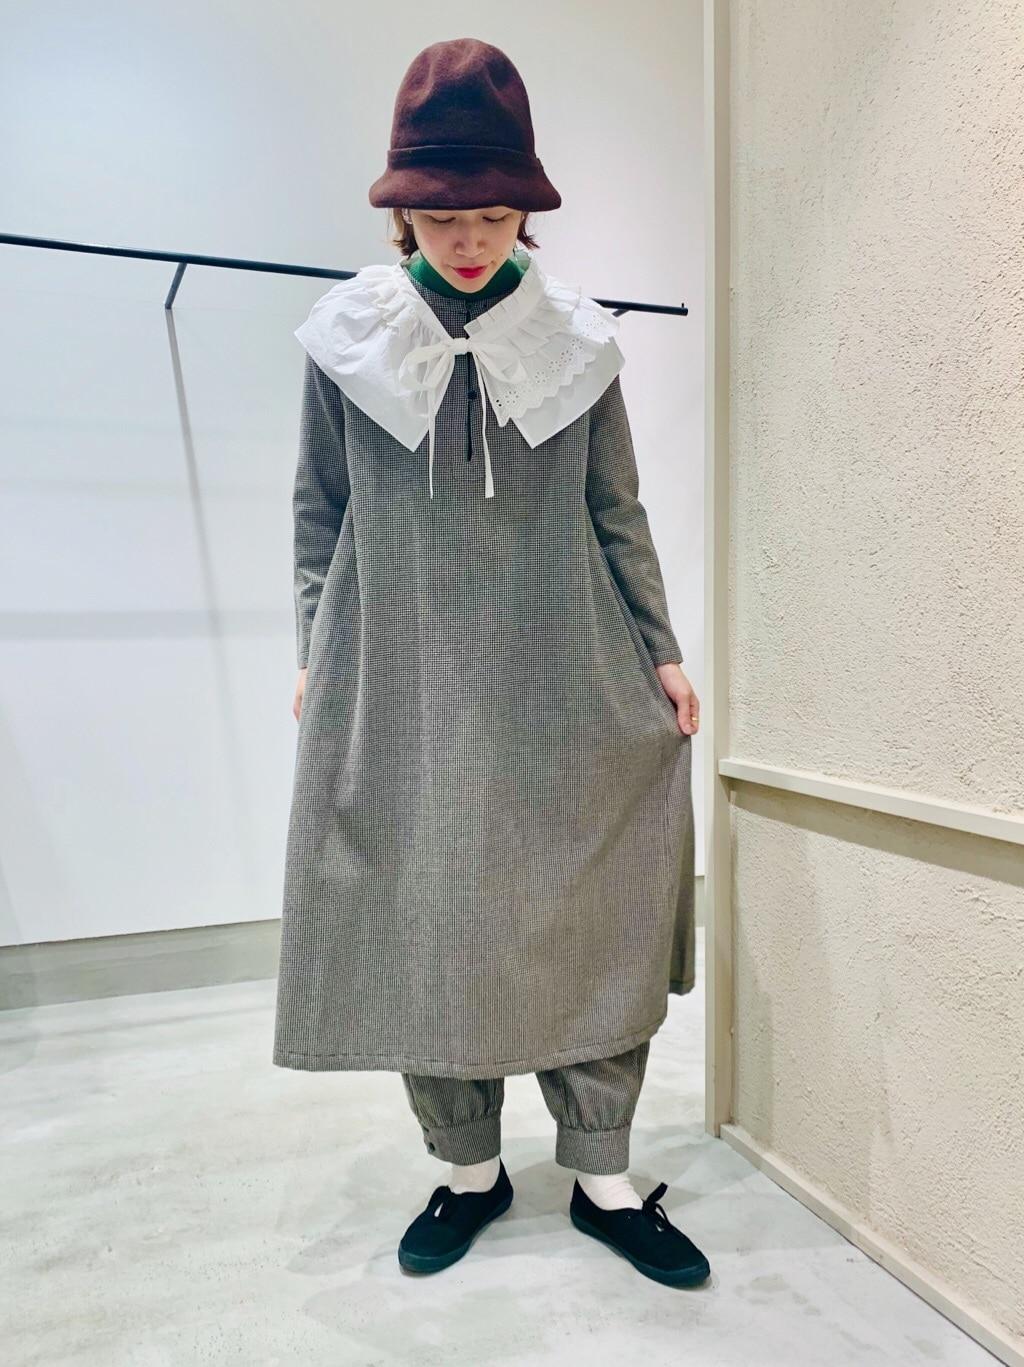 chambre de charme 横浜ジョイナス 身長:160cm 2020.12.22